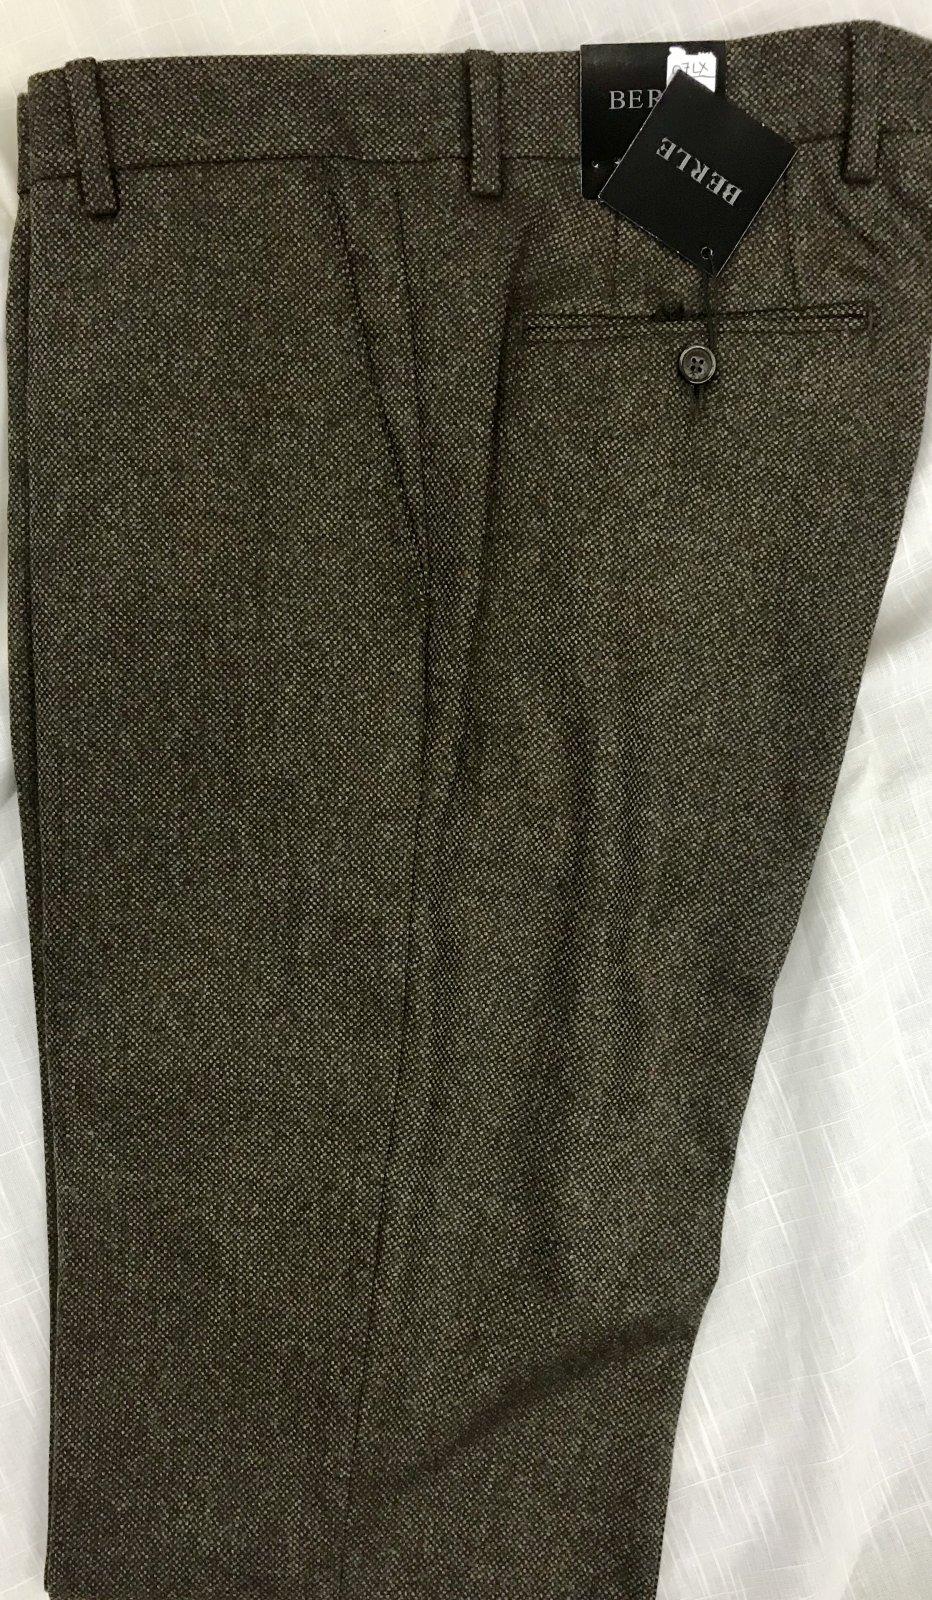 Berle Flannel Pant 8802-69